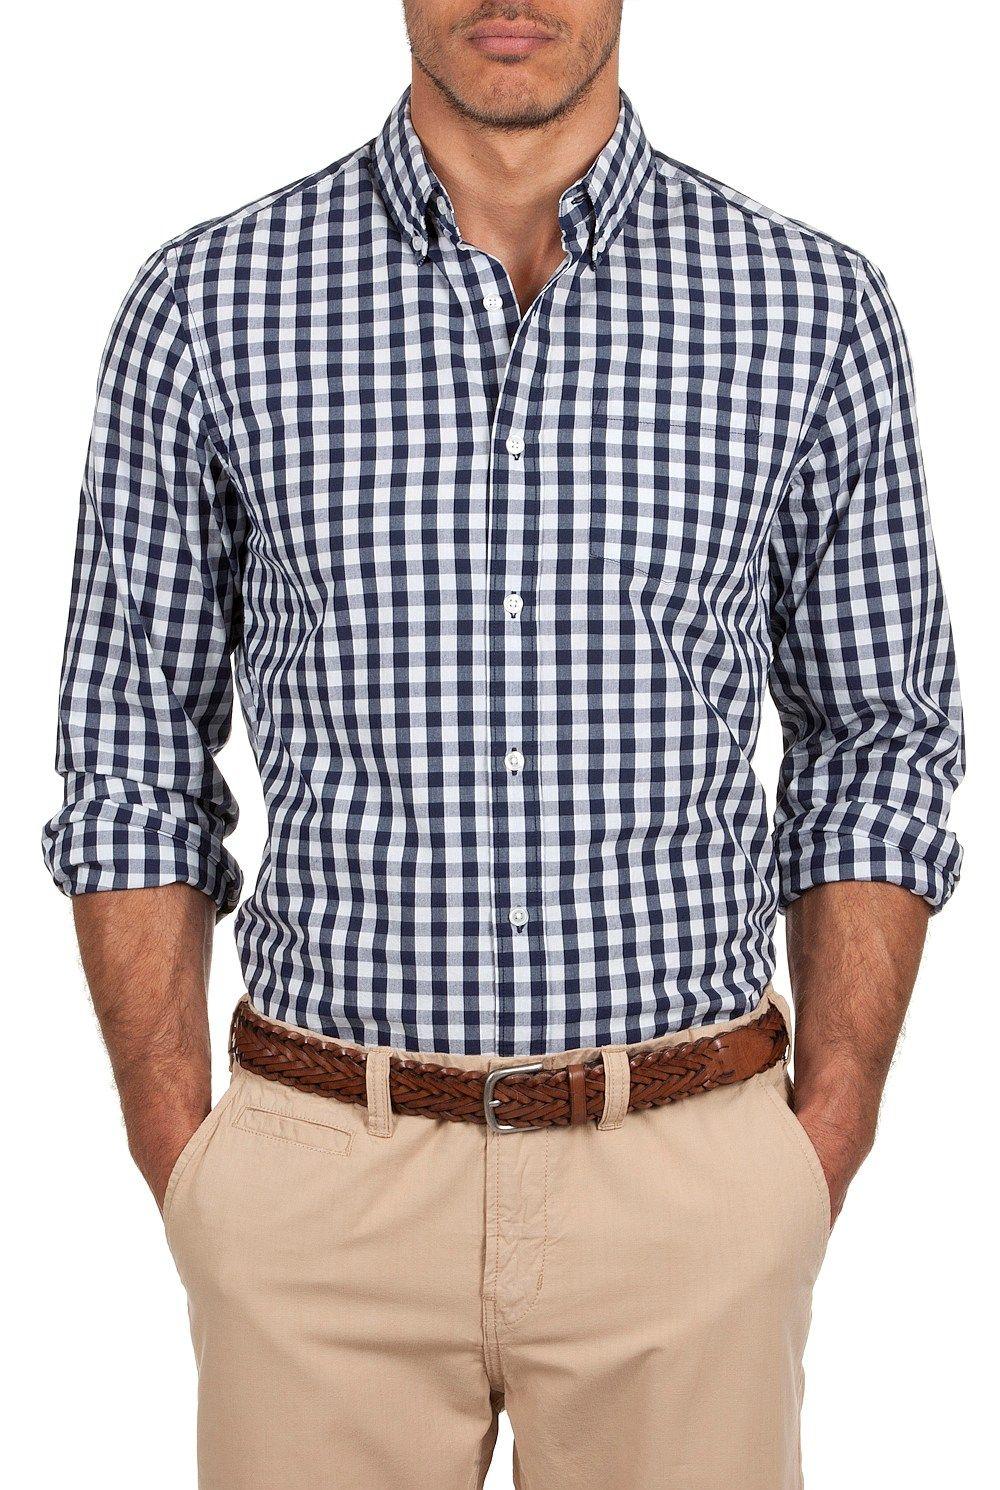 827ba99a7798 Country Road indigo gingham shirt.